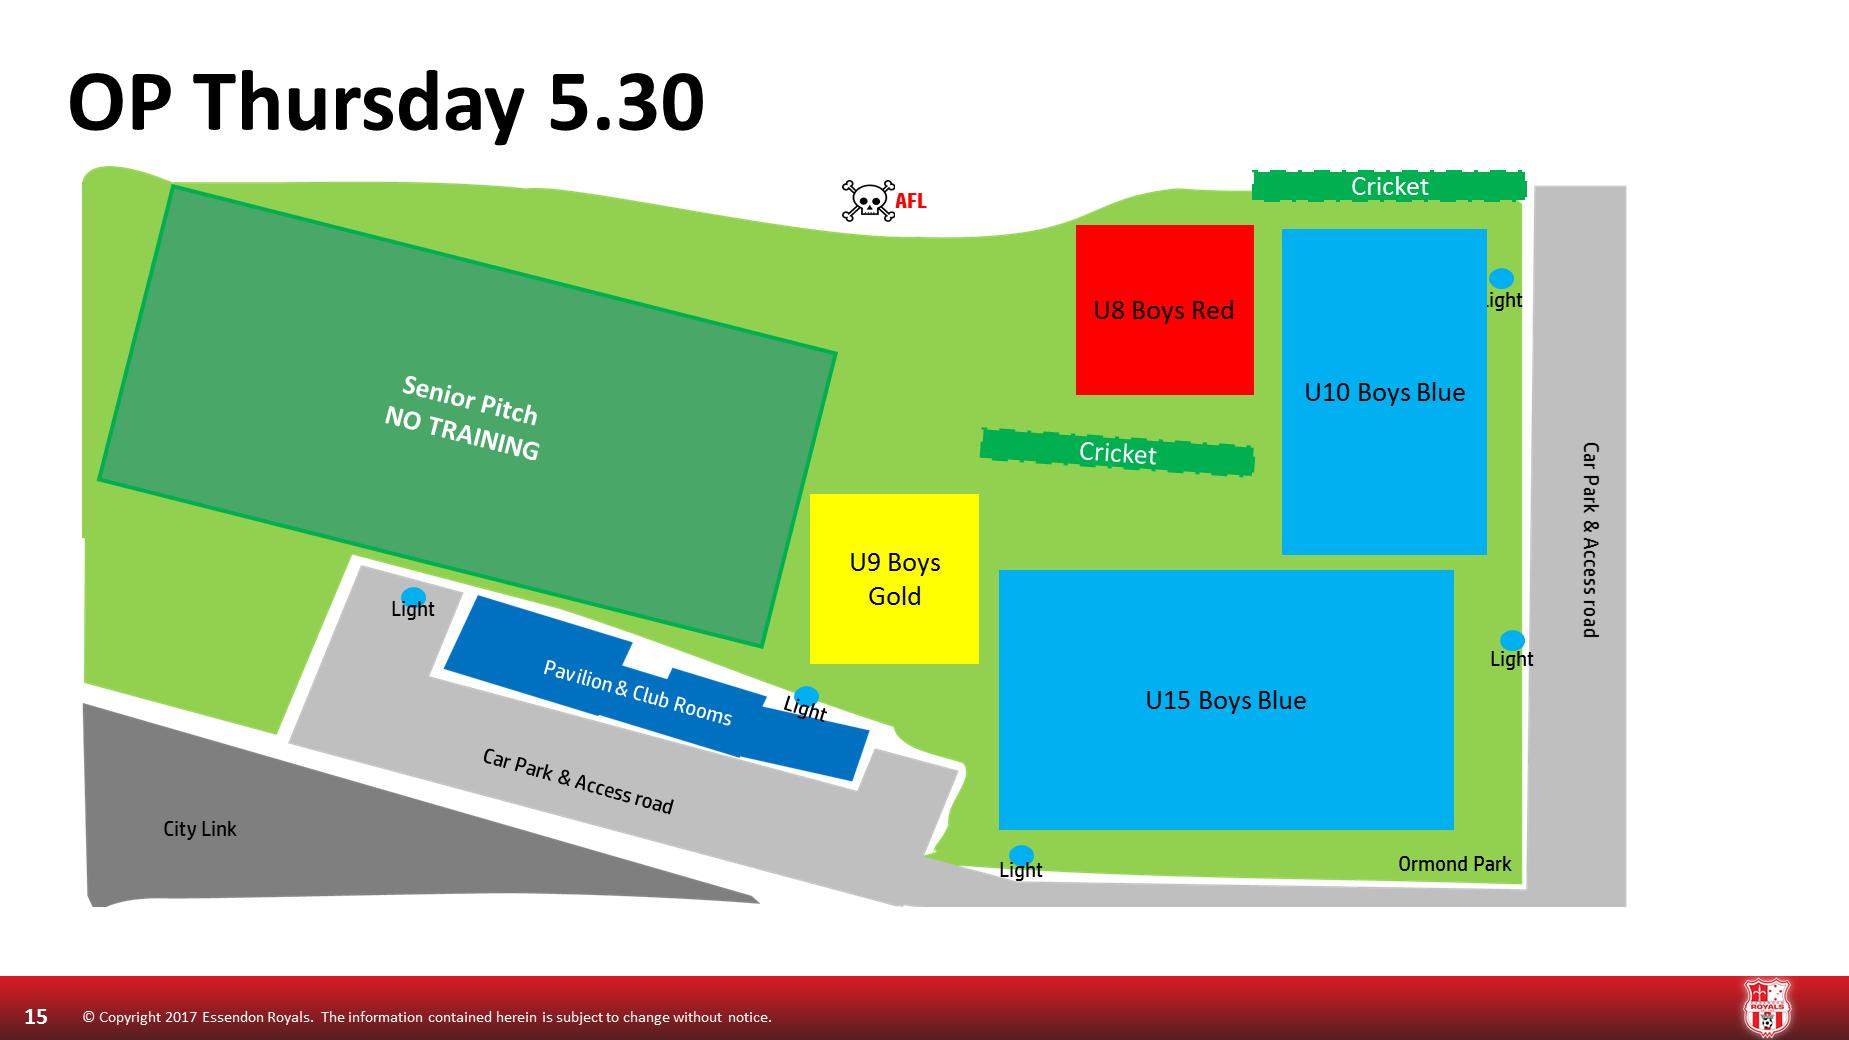 Thursday 5.30 Ormond Park